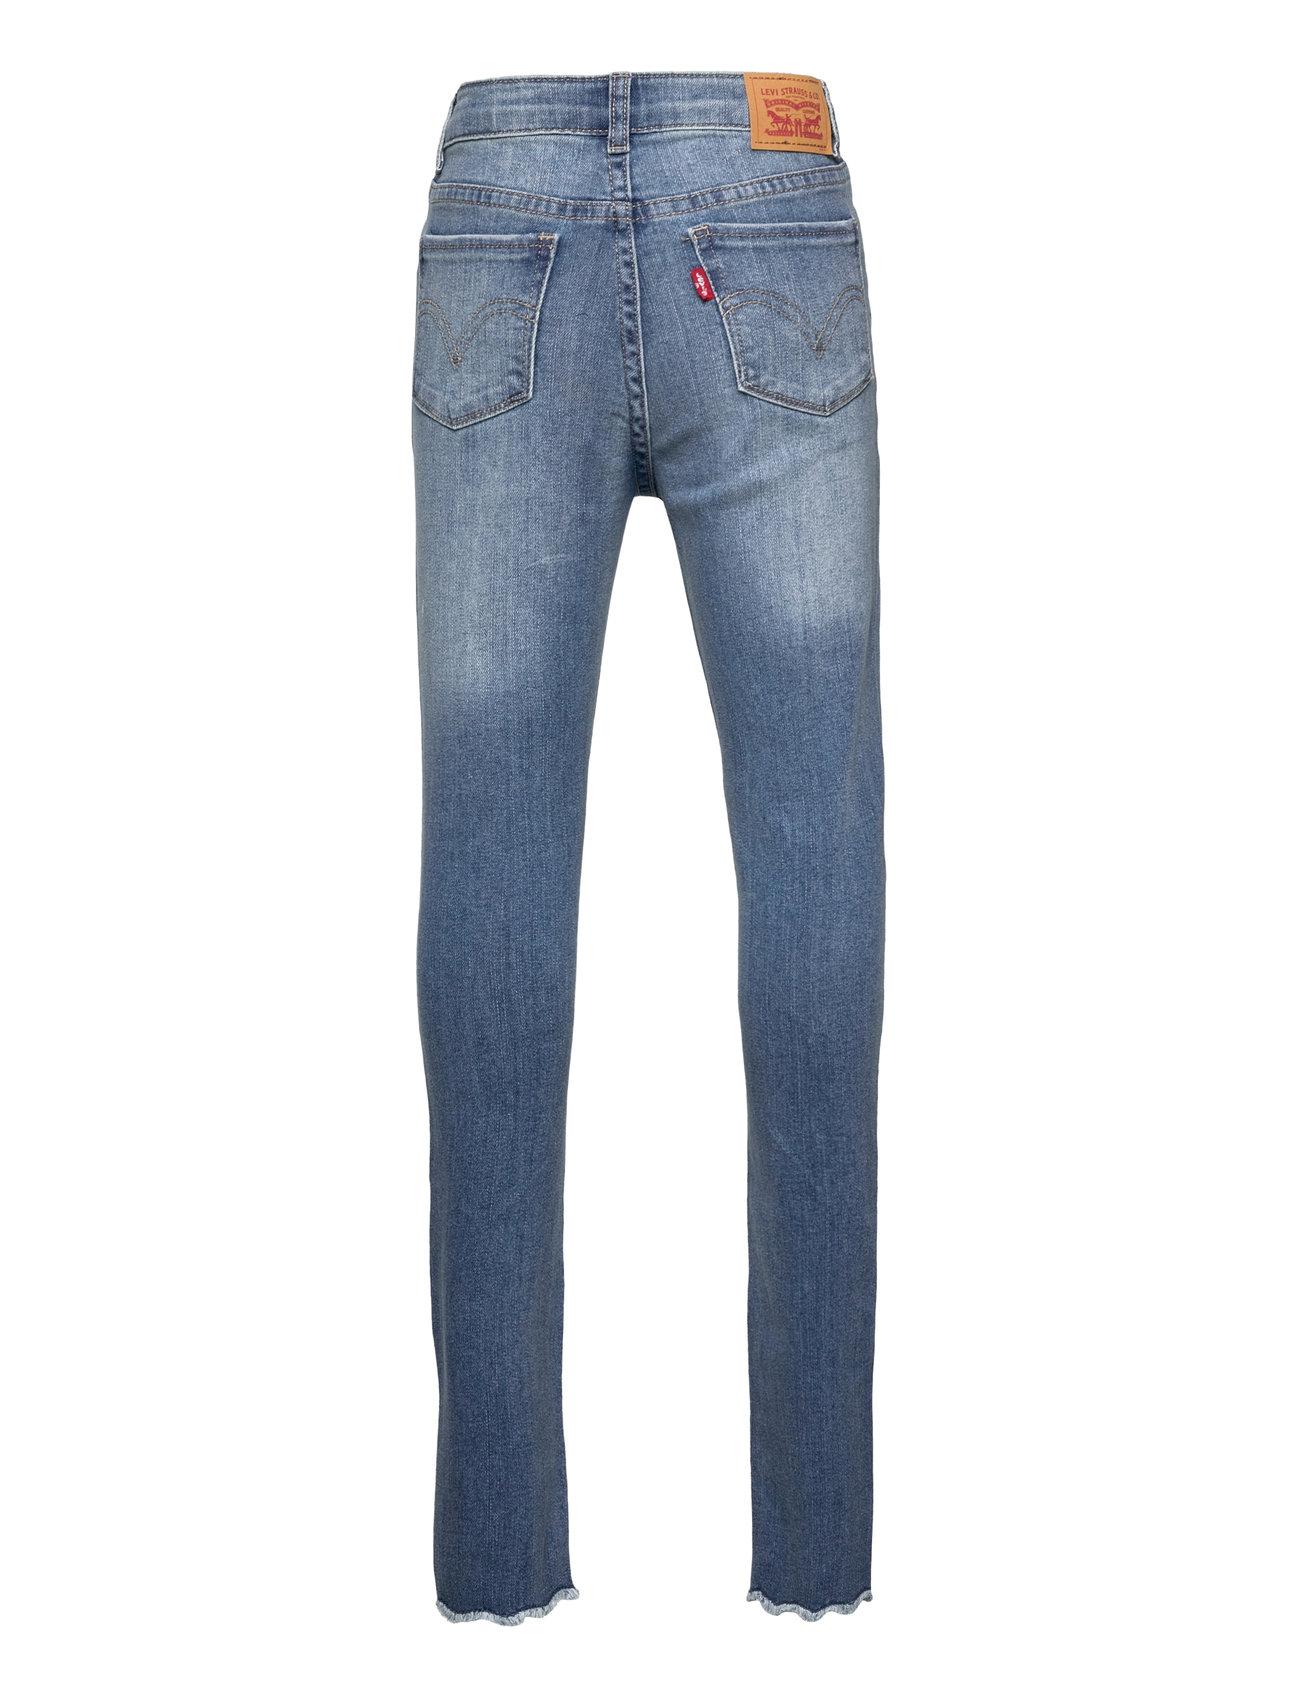 Levi's - LVG 720 HIGH RISE SUPER SKINNY - jeans - hometown blue - 1